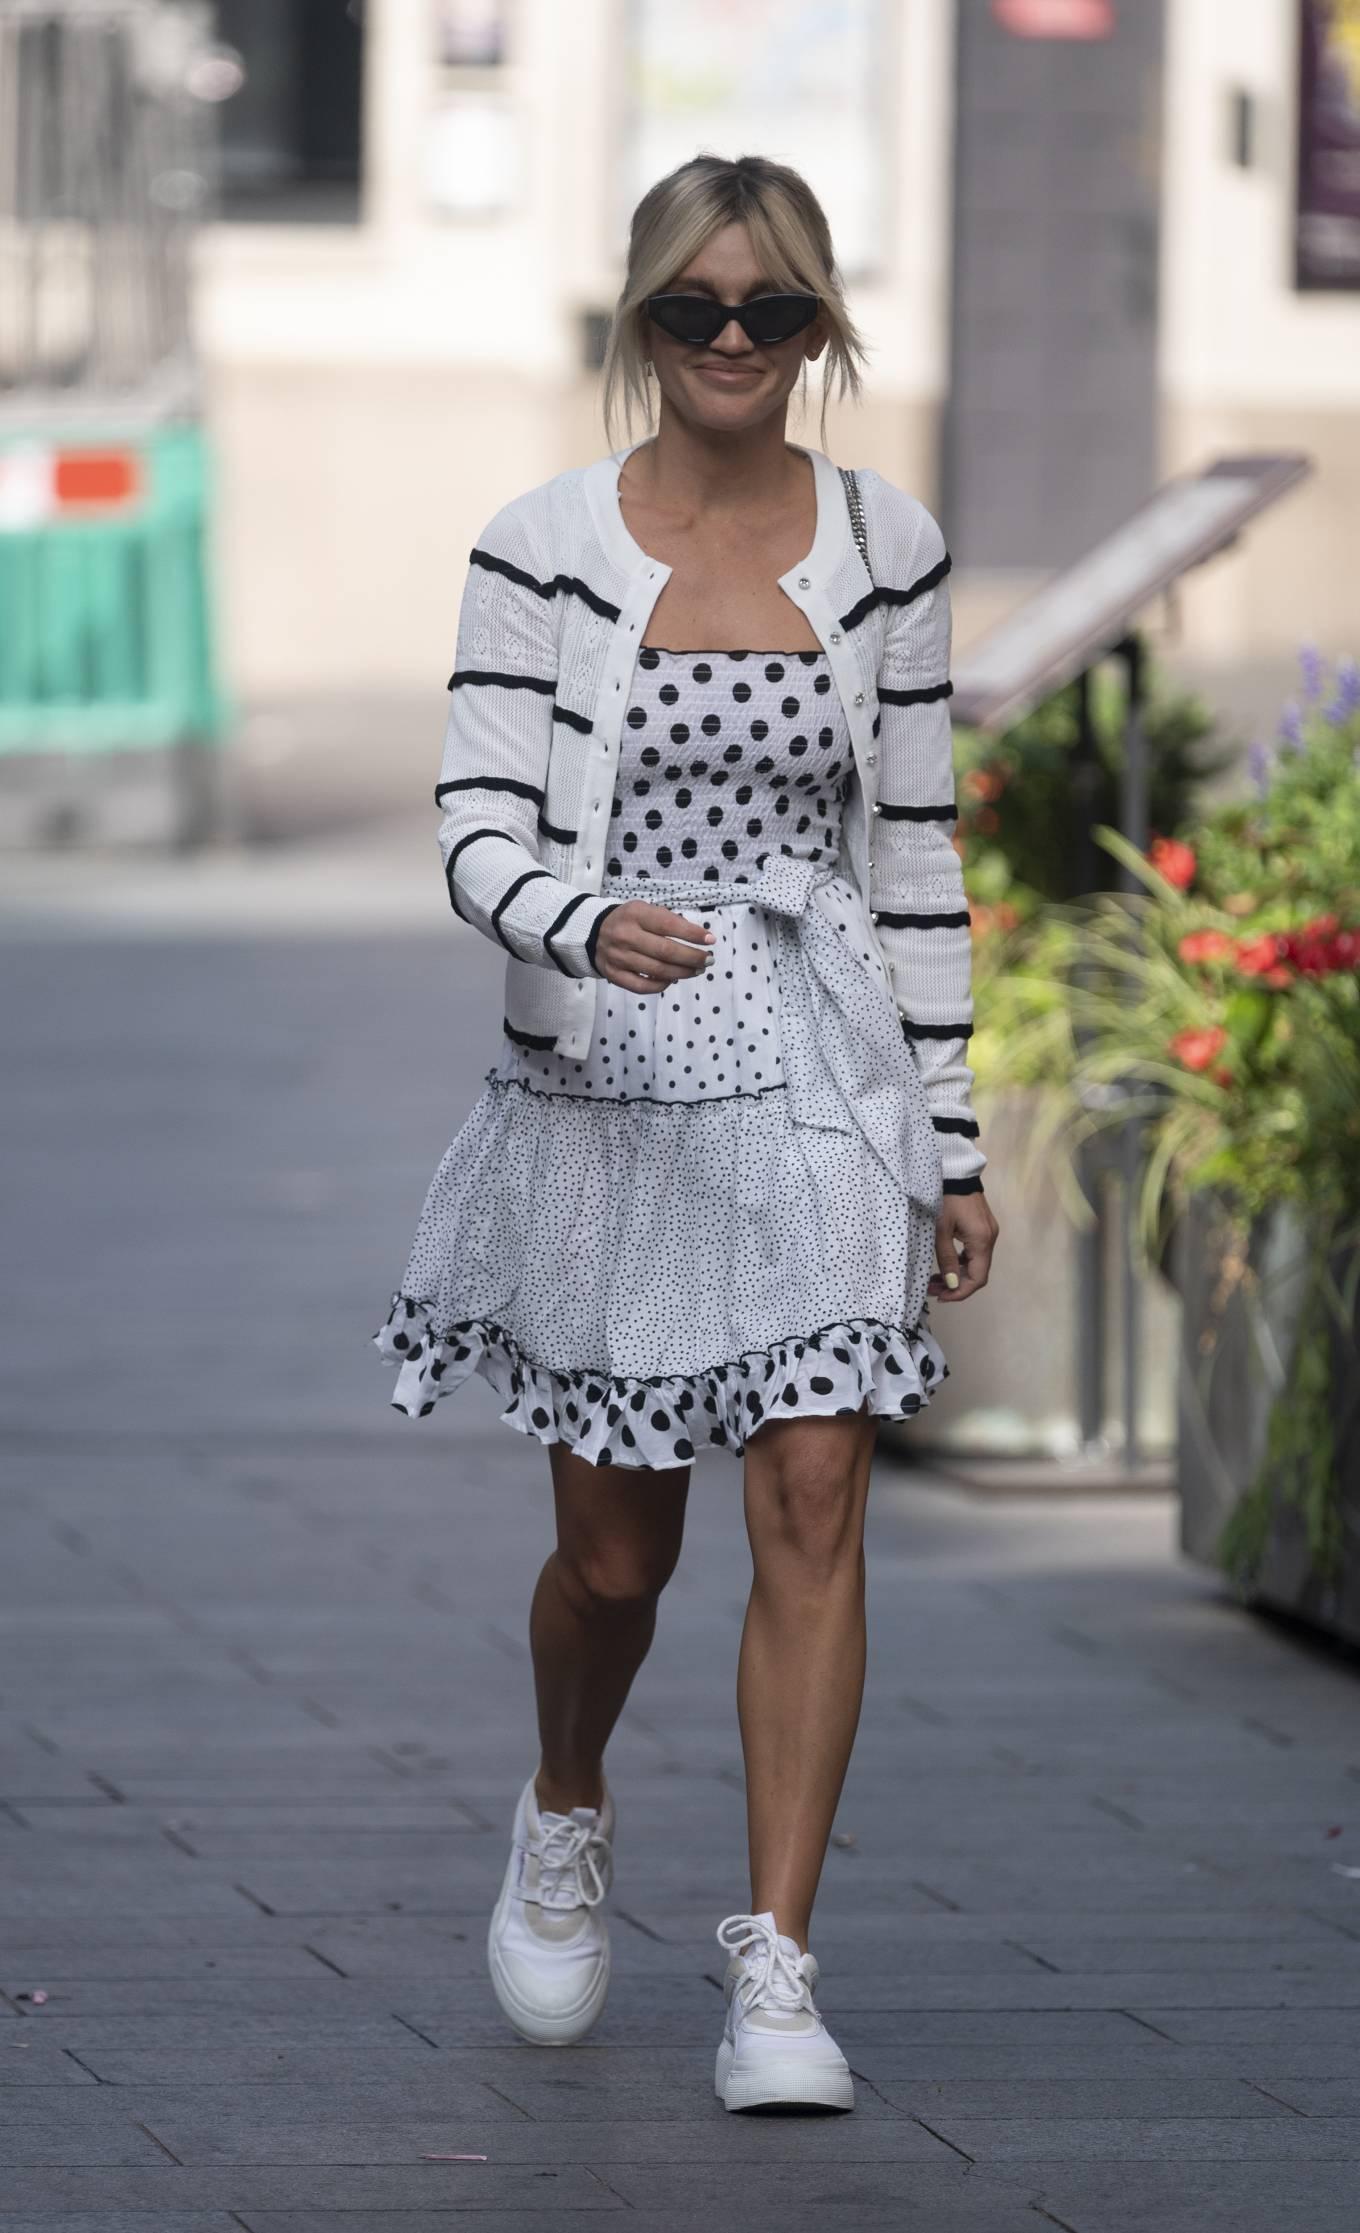 Ashley Roberts 2020 : Ashley Roberts – Wears White Polka Dot dress in London-03